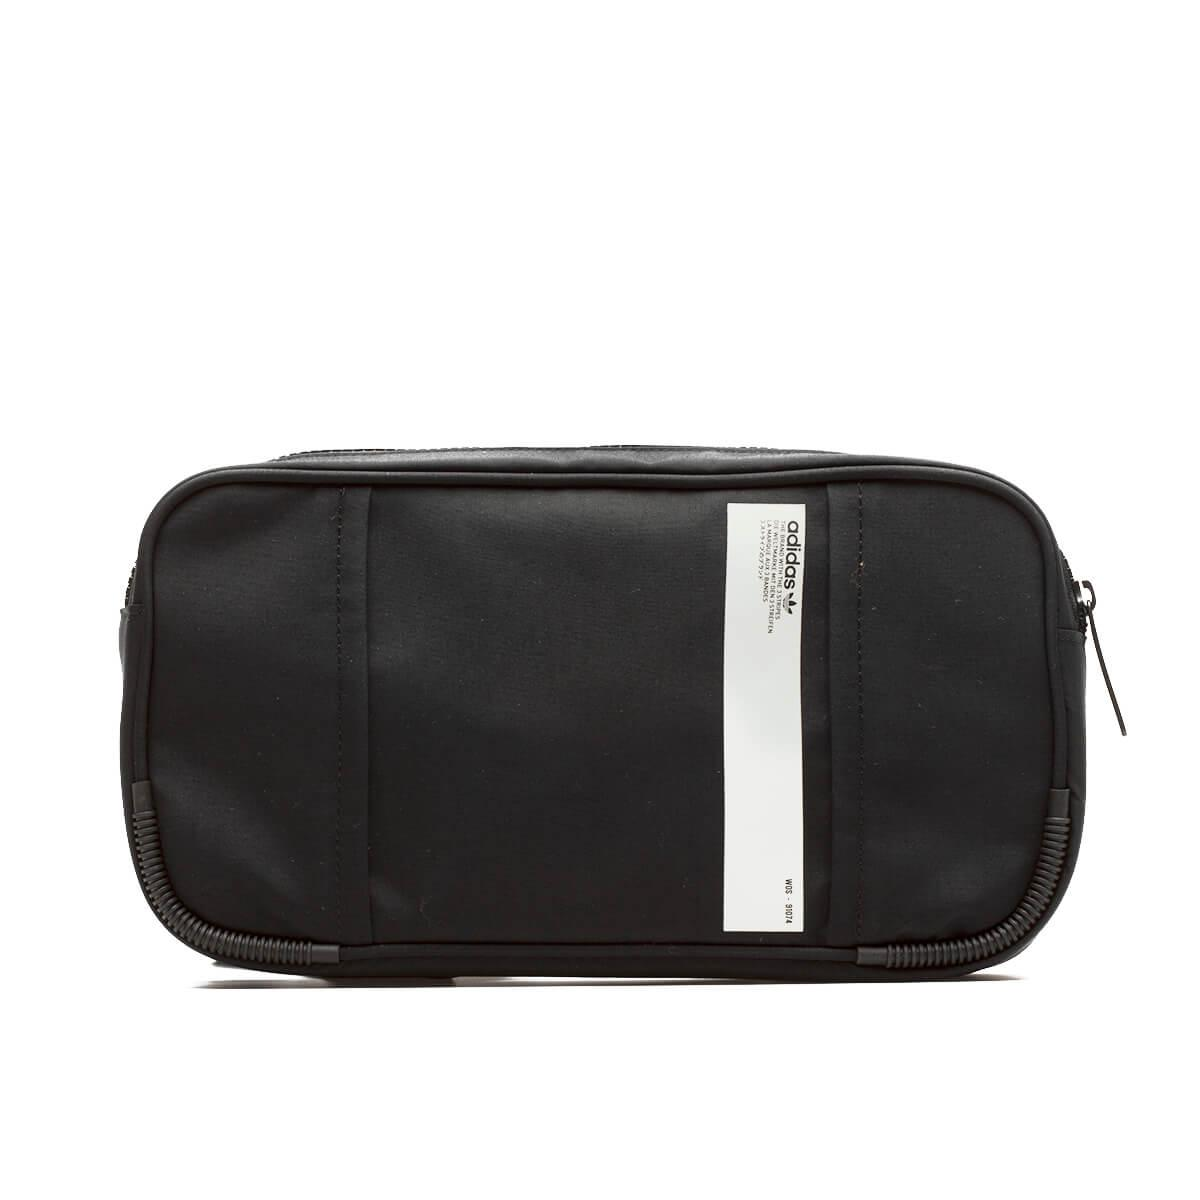 9996529a6ff2 Lyst - adidas Originals Nmd Fanny Bag in Black for Men